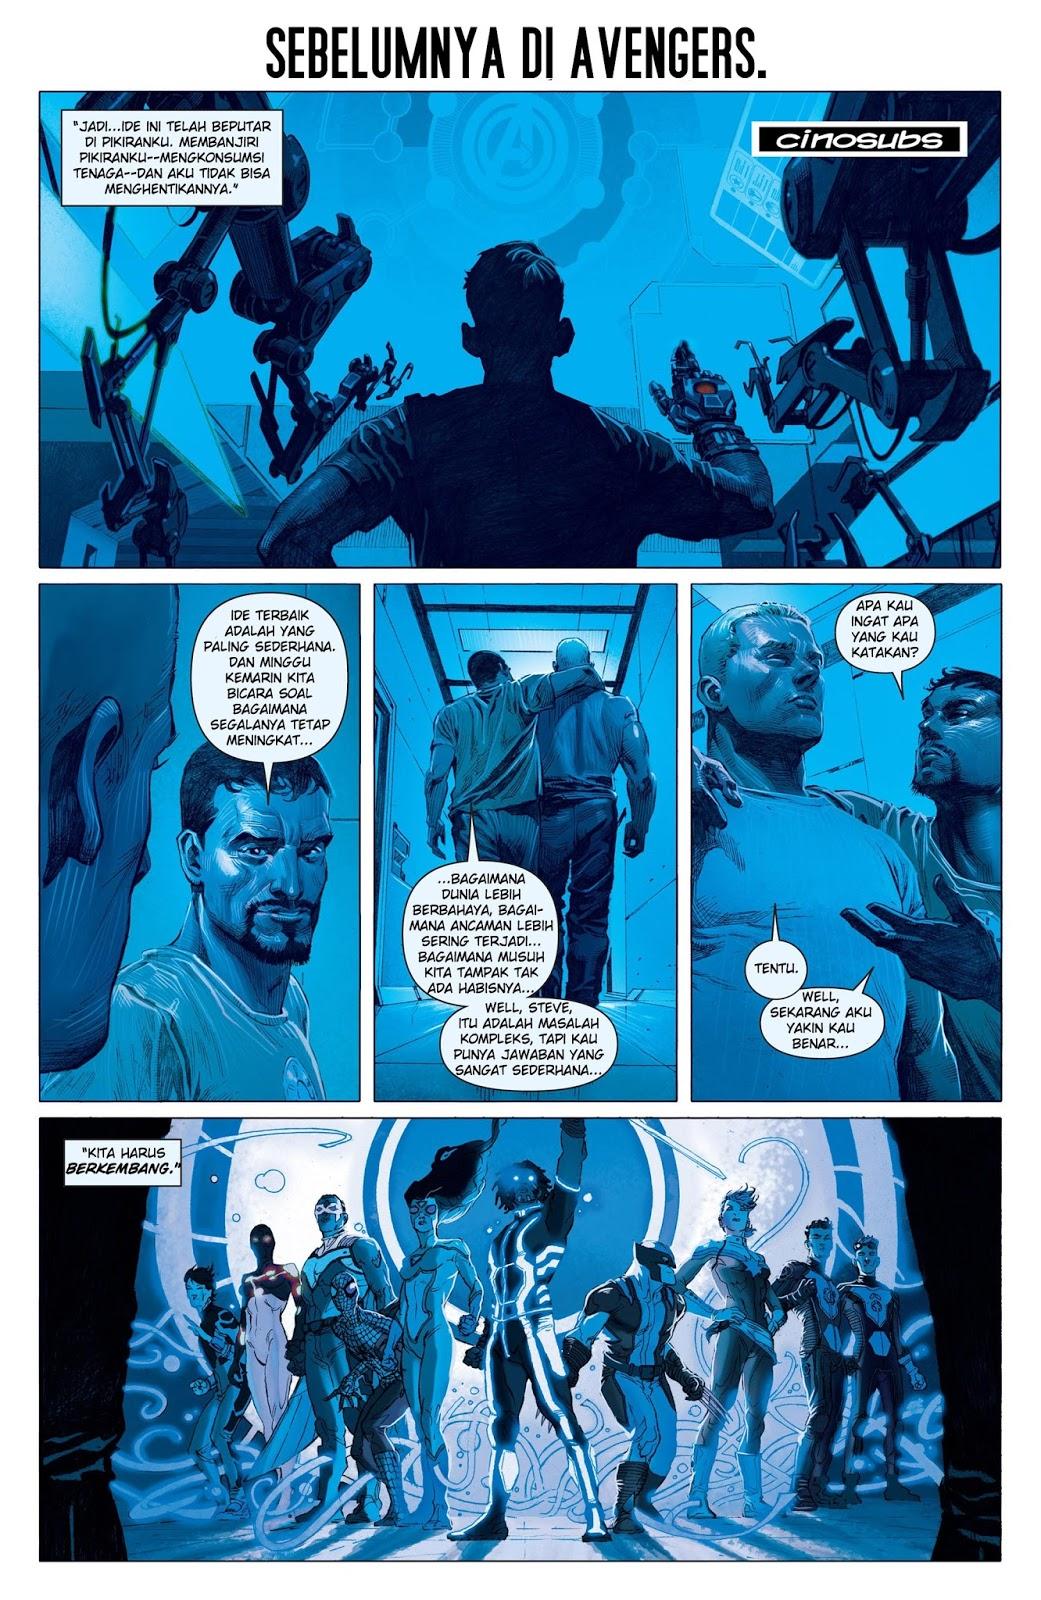 komik the avengers 5 2012  komik pos  baca komik